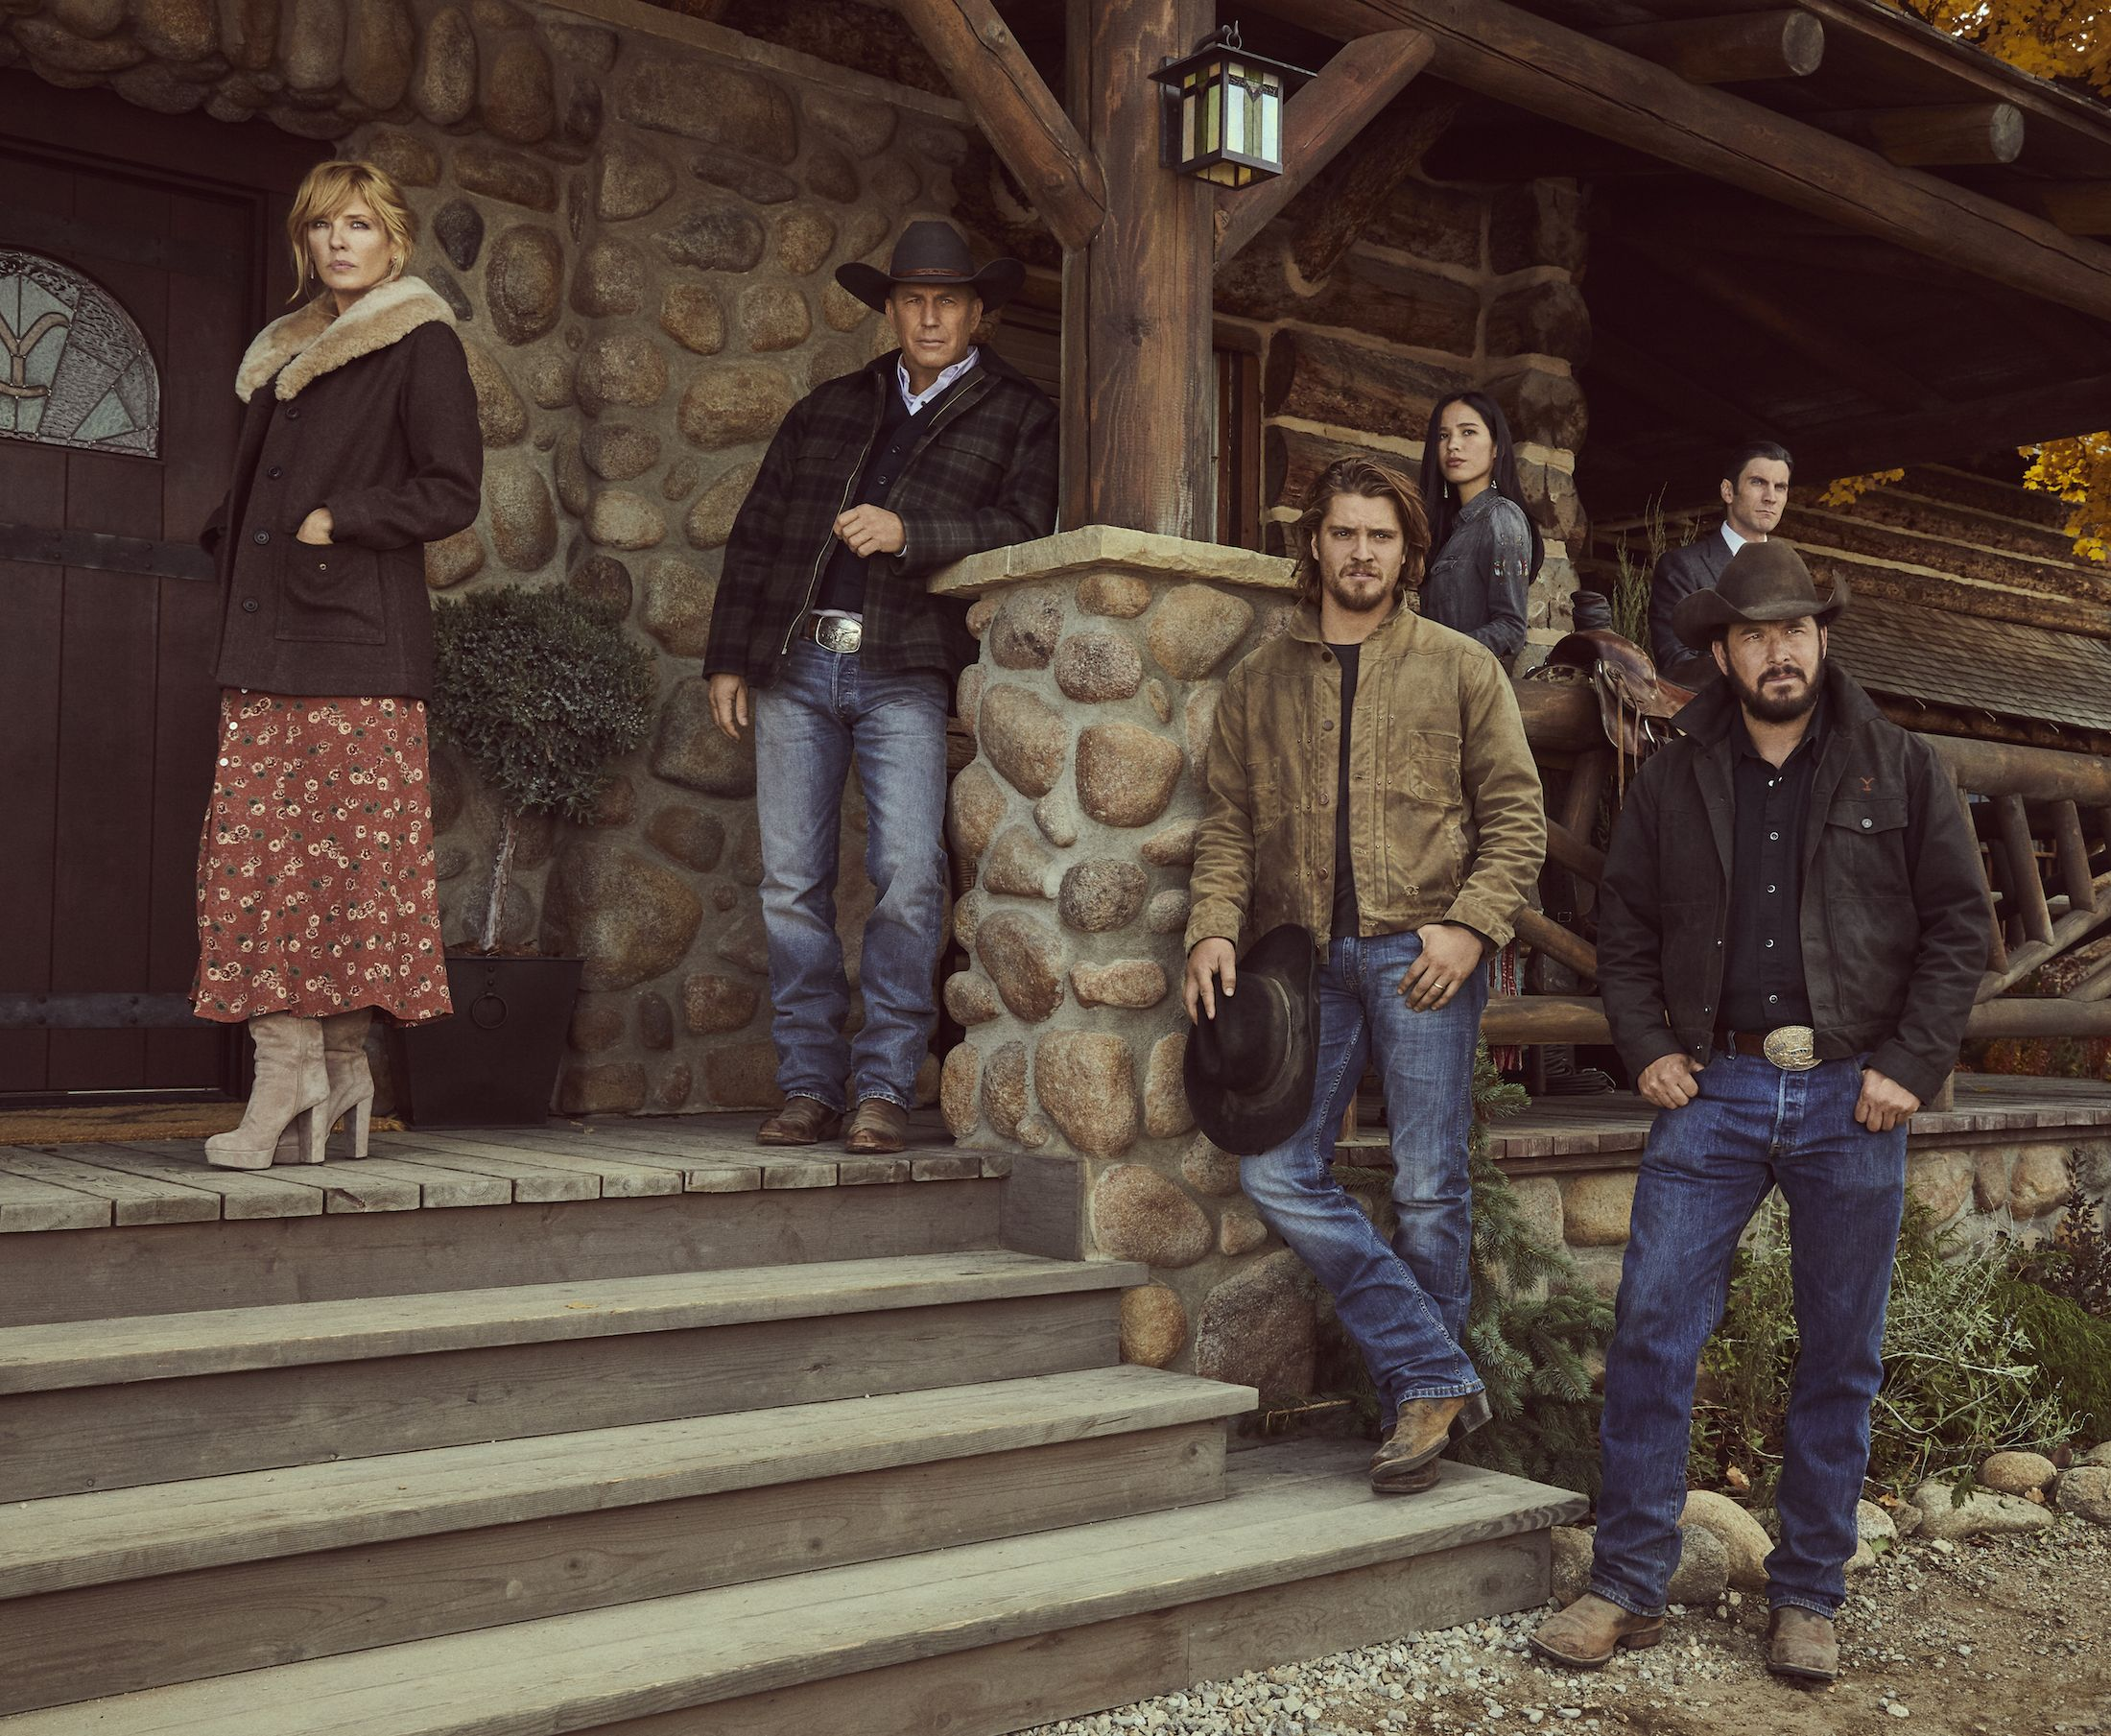 Yellowstone' Season 2 Cast - 'Yellowstone' Show Cast Info